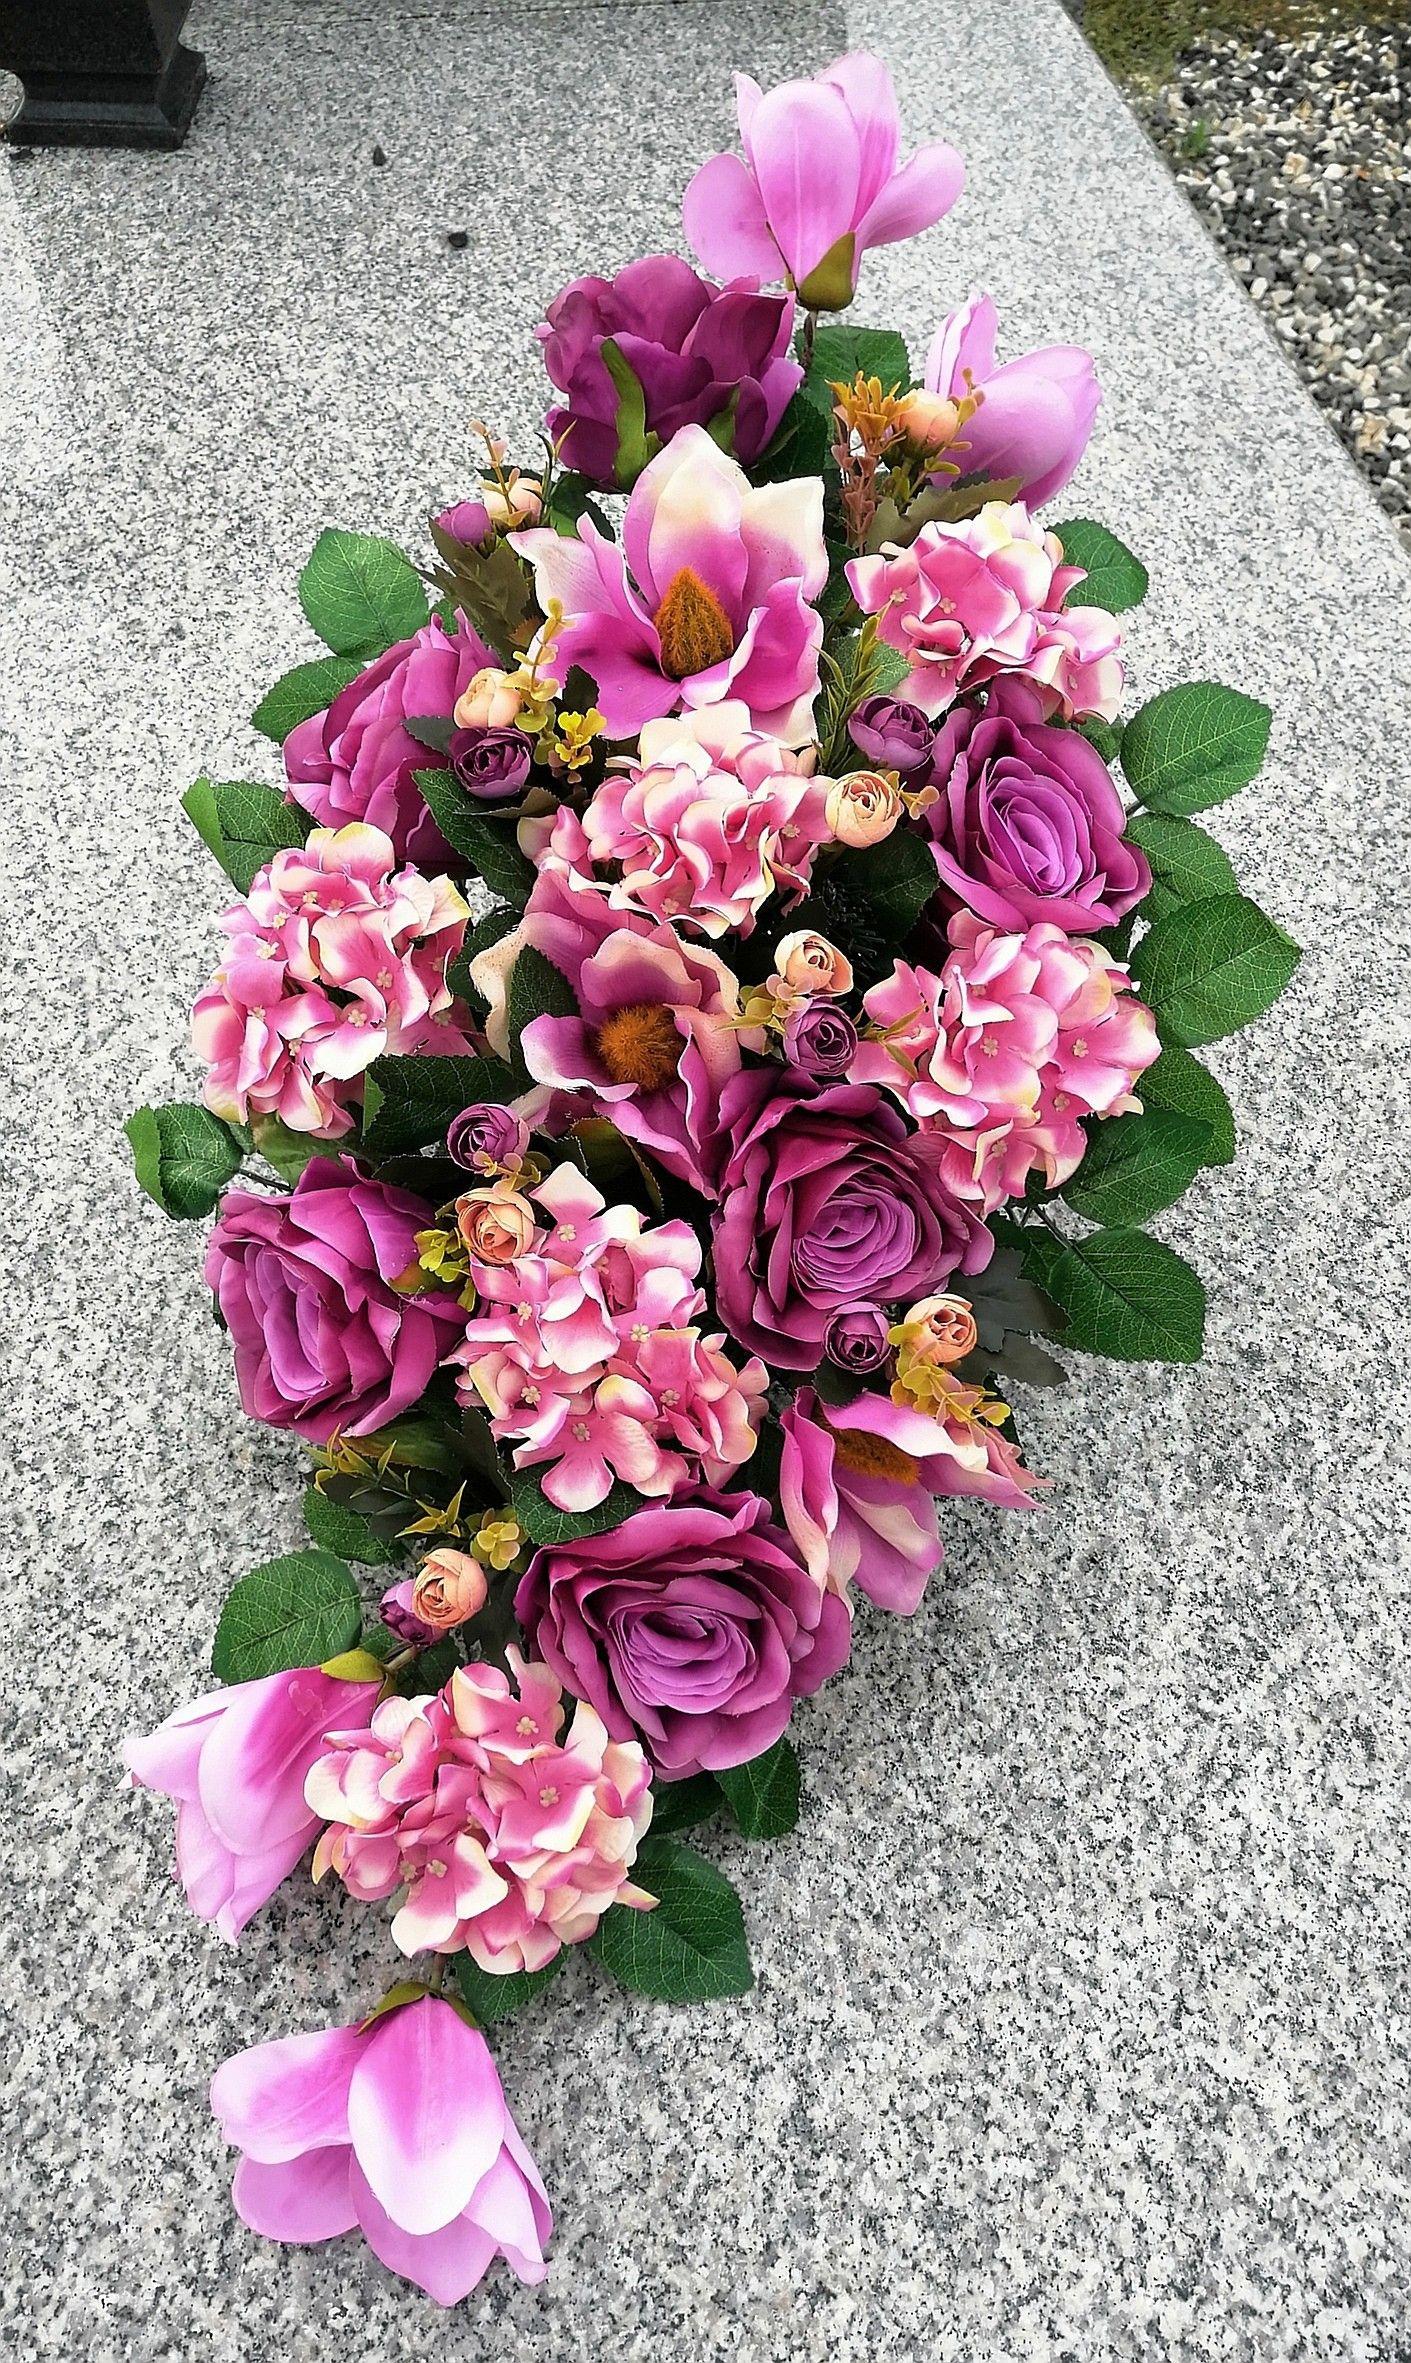 Pin By Urszula Jagielnik On Moje Prace Flower Arrangements Floral Wreath Floral